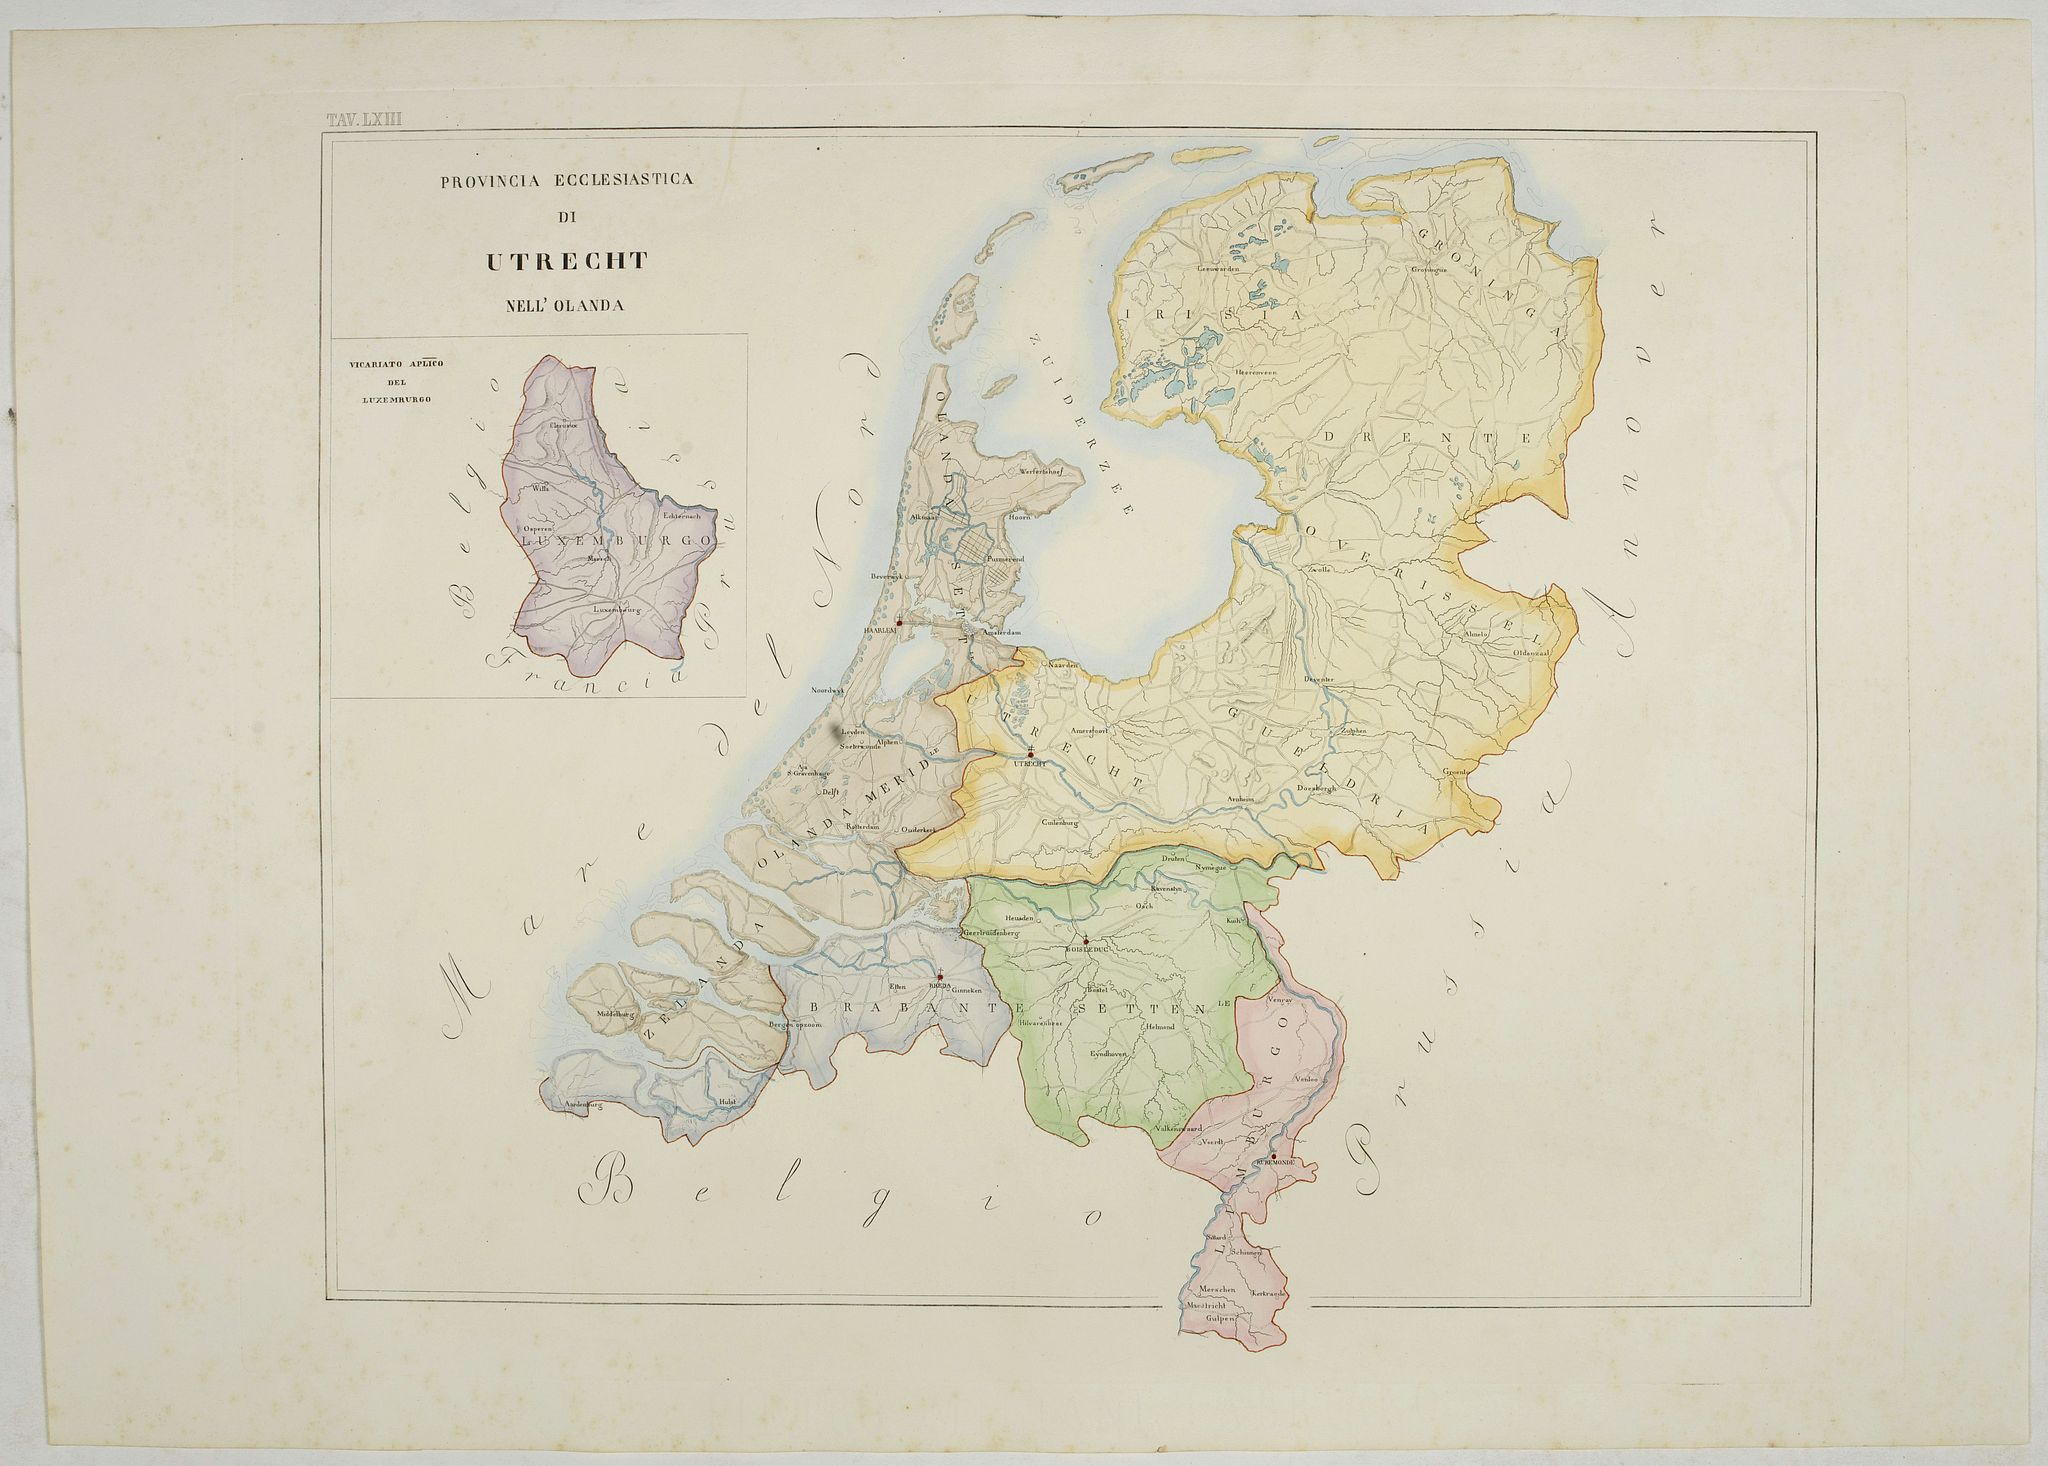 PETRI  Girolamo -  Provincia ecclesiastica di Utrecht Nell' Olanda (Tav LXIII)